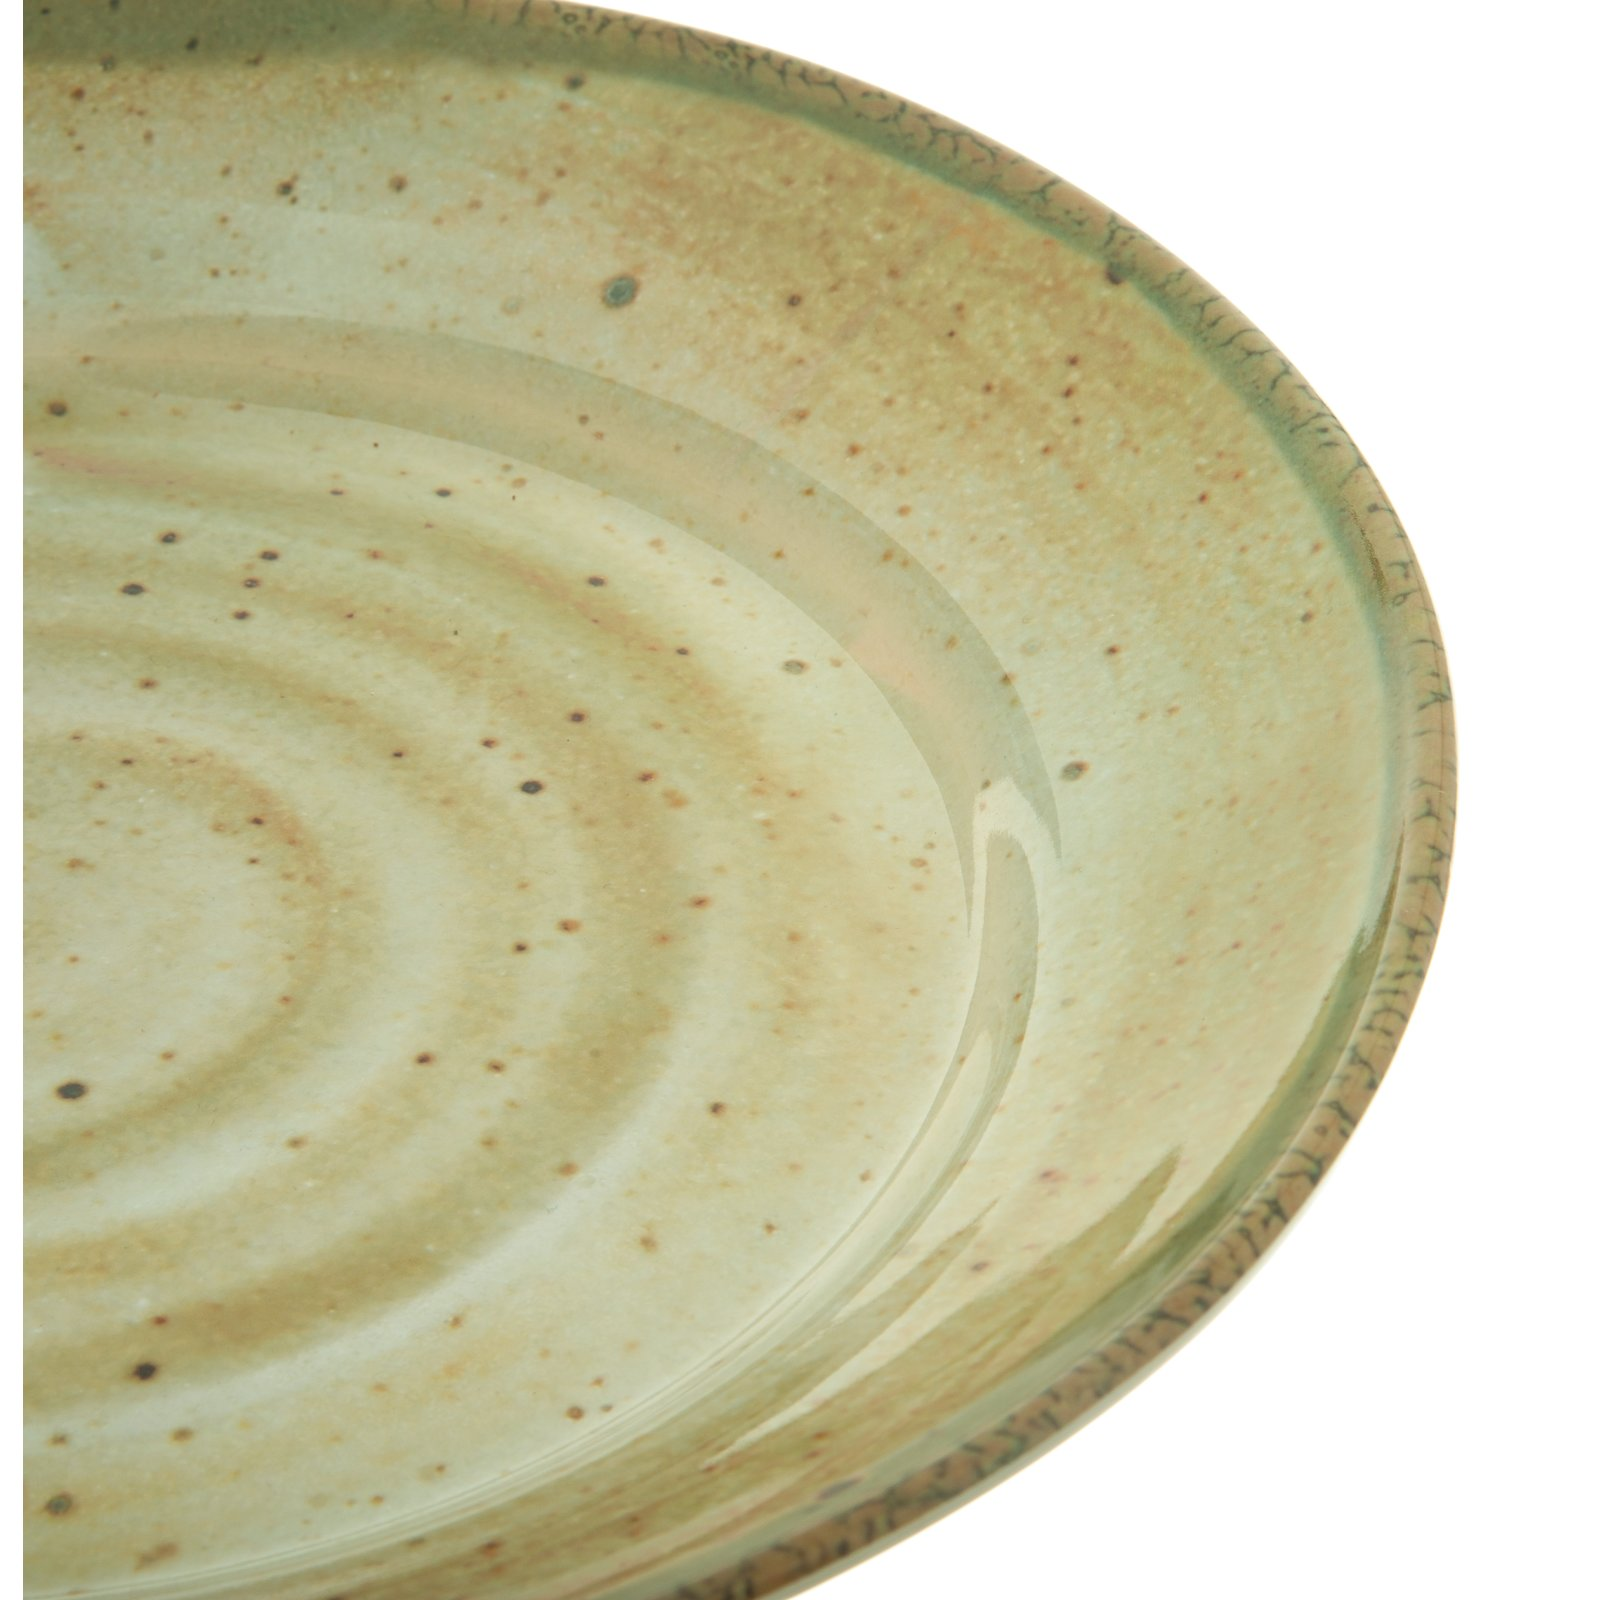 ... GA5501370 - Gathering Melamine Charger Plate 12.5  - Adobe  sc 1 st  Carlisle FoodService Products & GA5501370 - Gathering Melamine Charger Plate 12.5